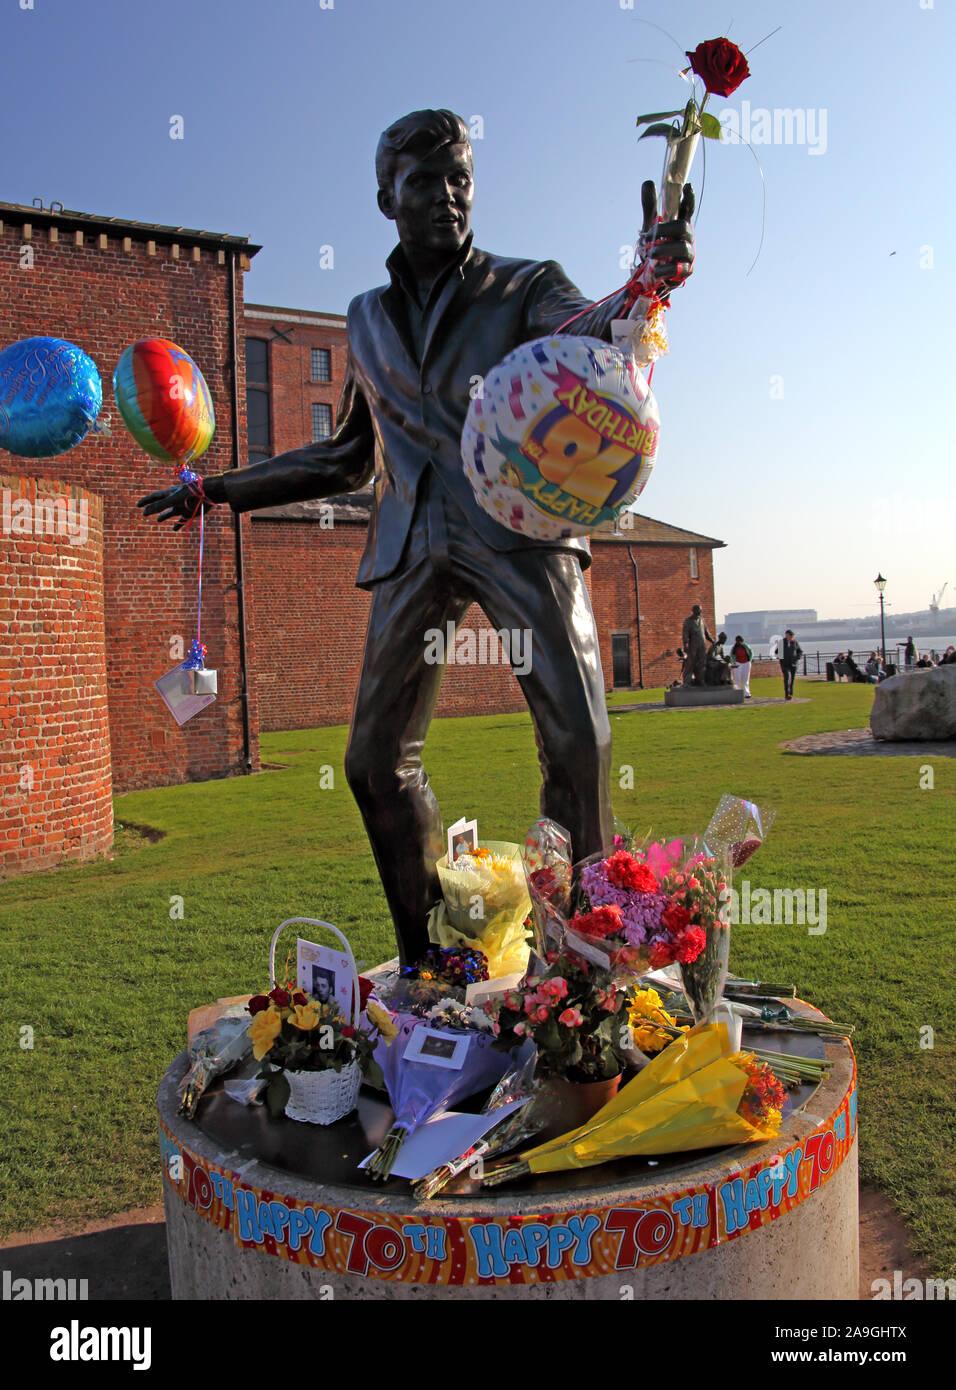 Billy Fury statue, 70 years old anniversary,musician,Albert Dock, Liverpool, England, UK, L3 4BB Stock Photo